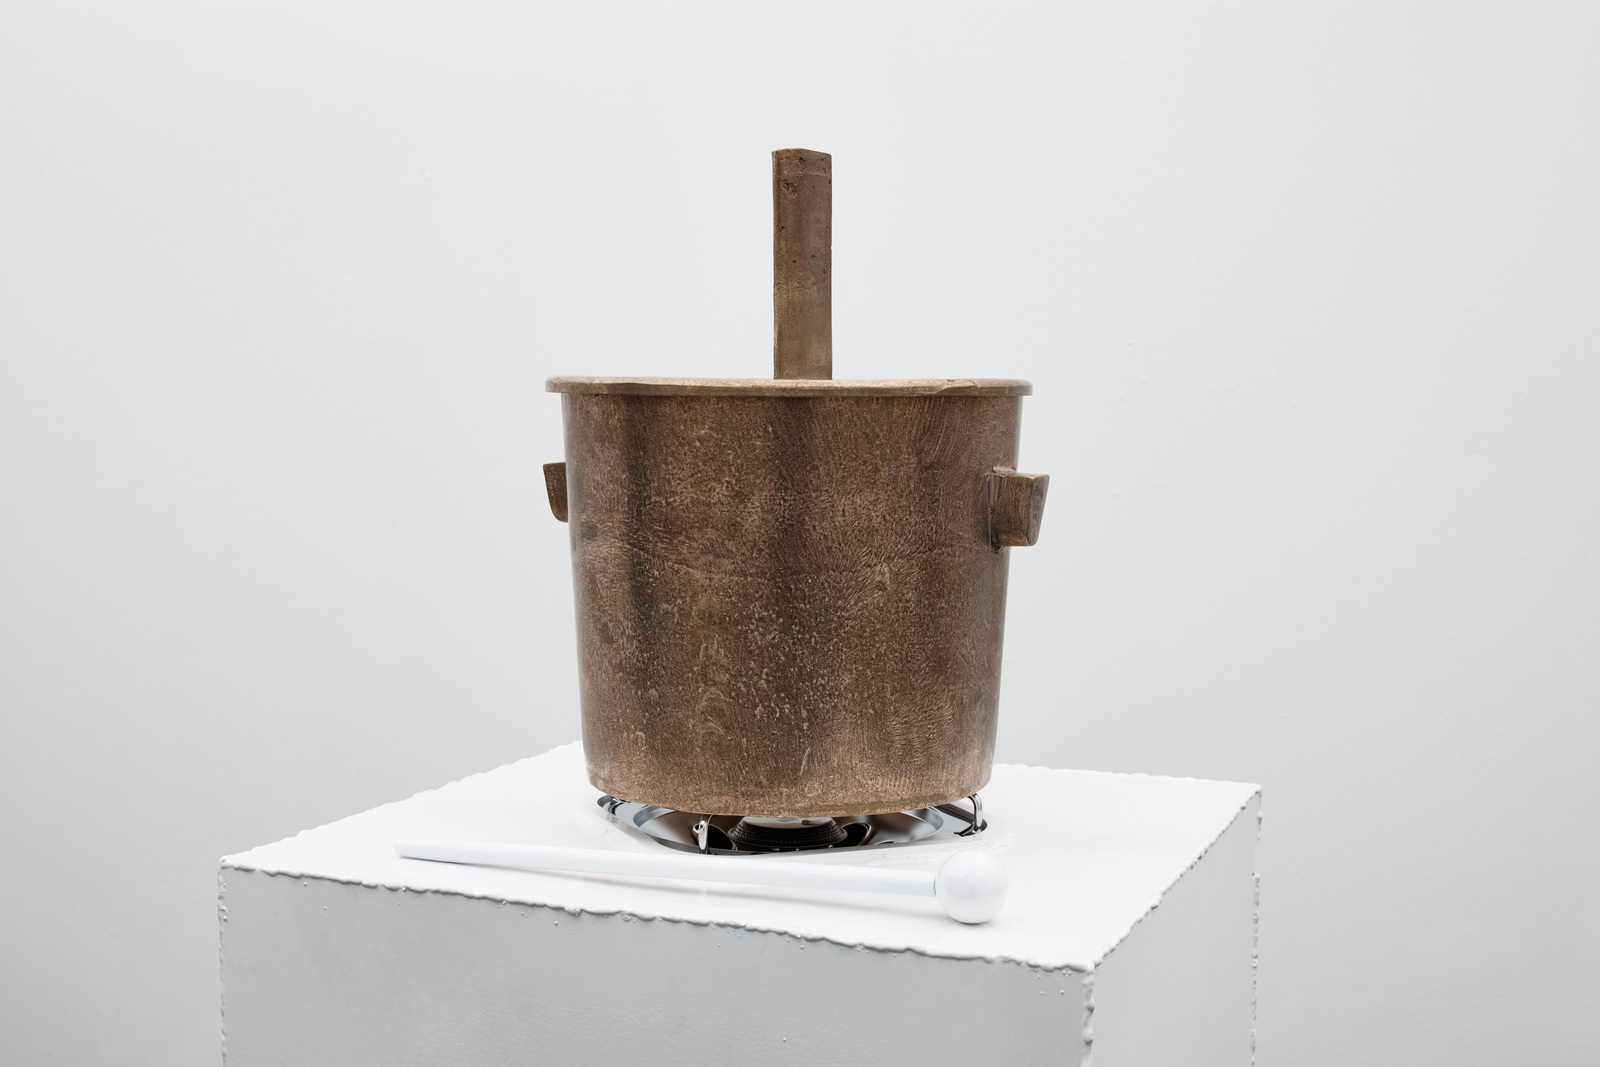 Franz West - Caldare ( A mobile stove sculpture object) Detail, 1991